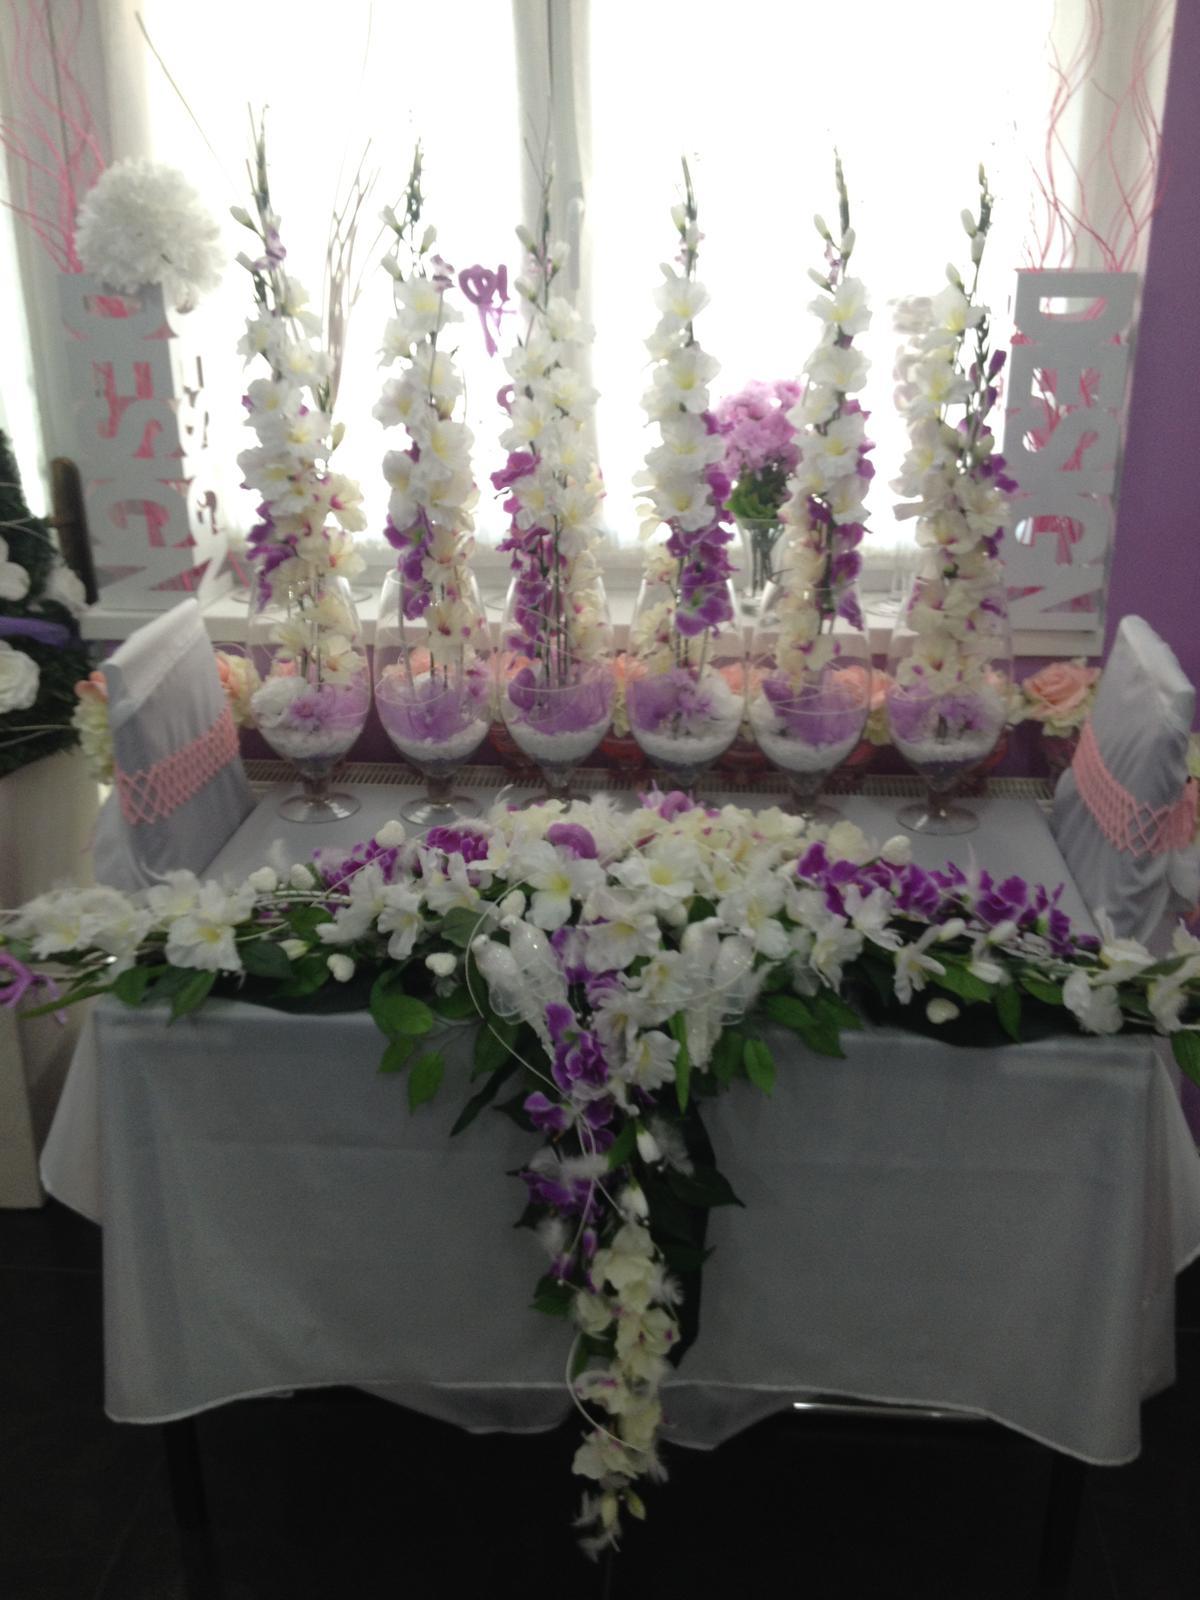 S & M Weding fialovo biela . - Obrázok č. 2